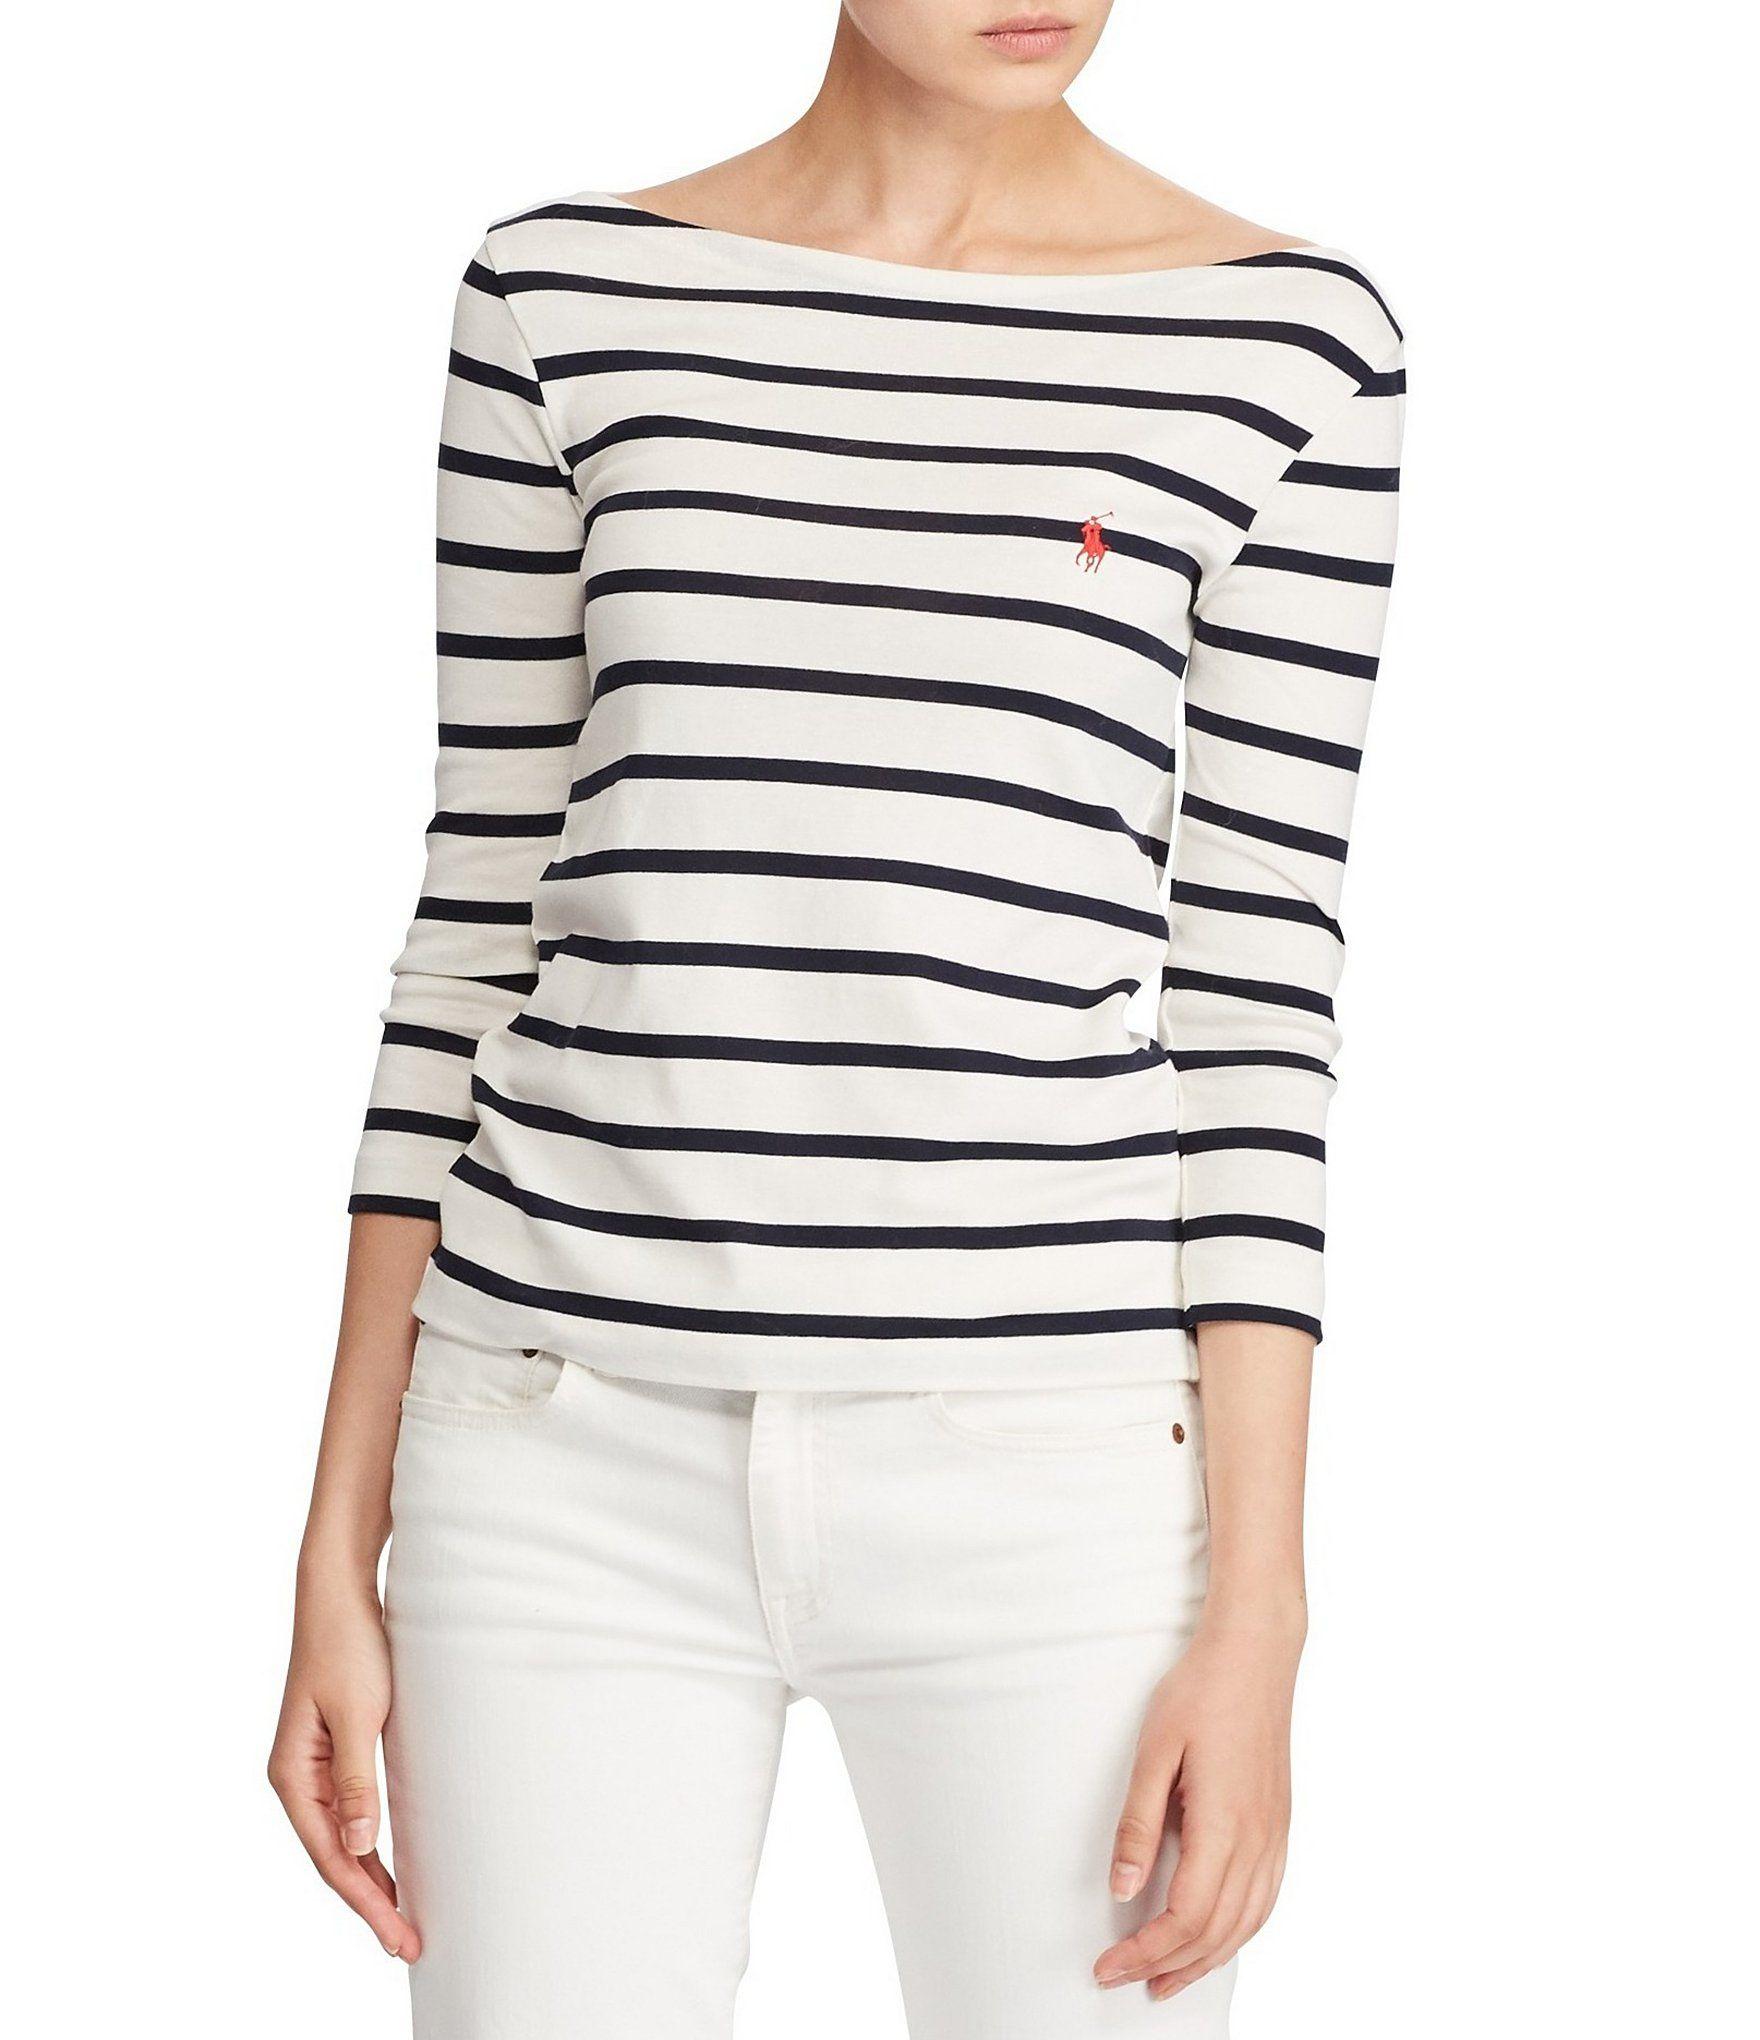 Polo Ralph Lauren Striped Cotton TShirt  Dillards   Sara - Deep ... c85b70cdb1